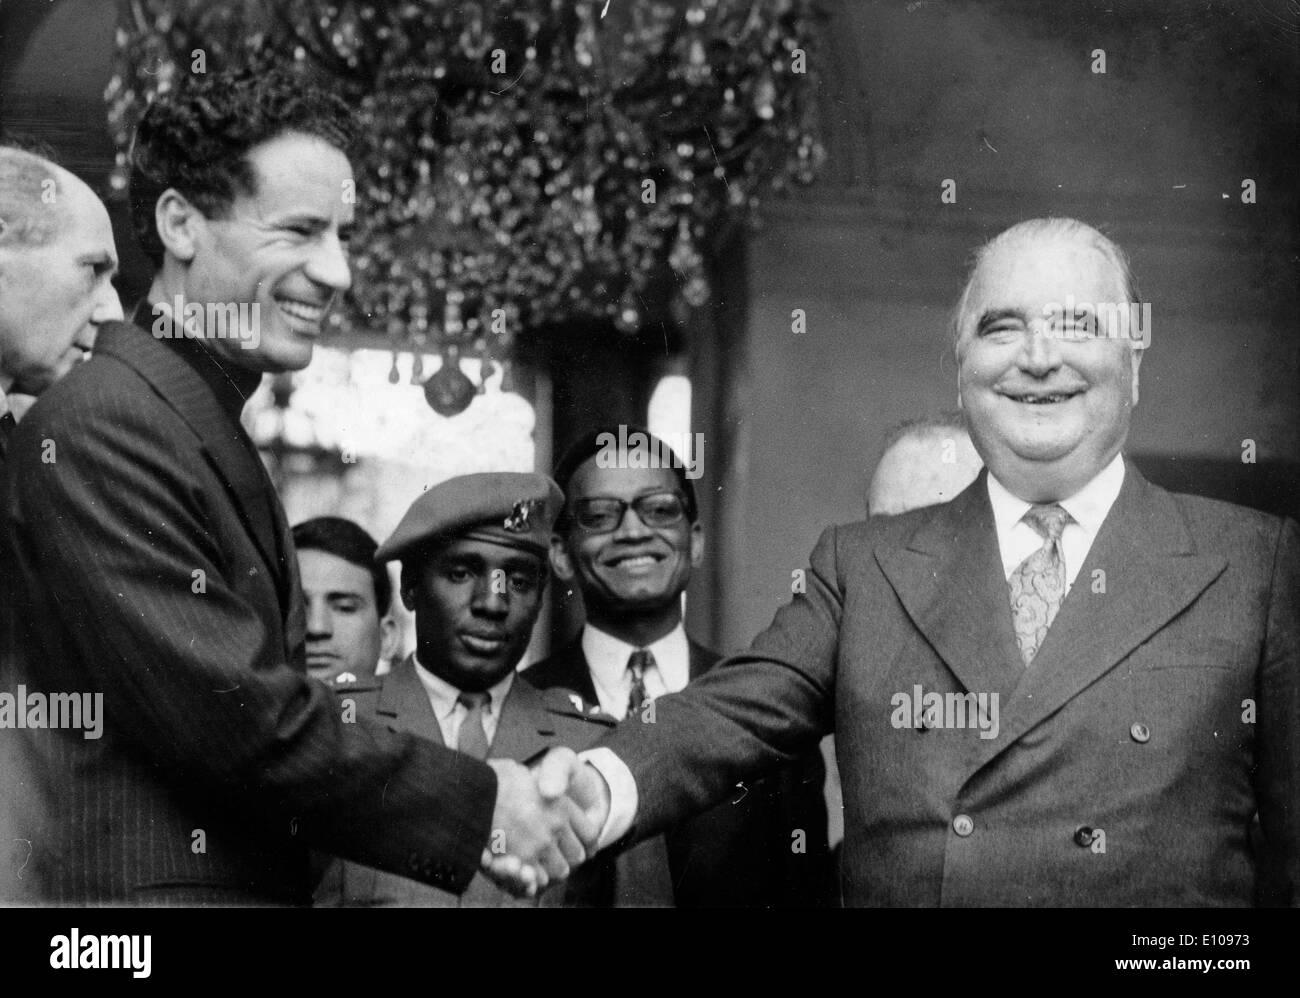 President Georges Pompidou meets Muammar al-Gaddafi - Stock Image